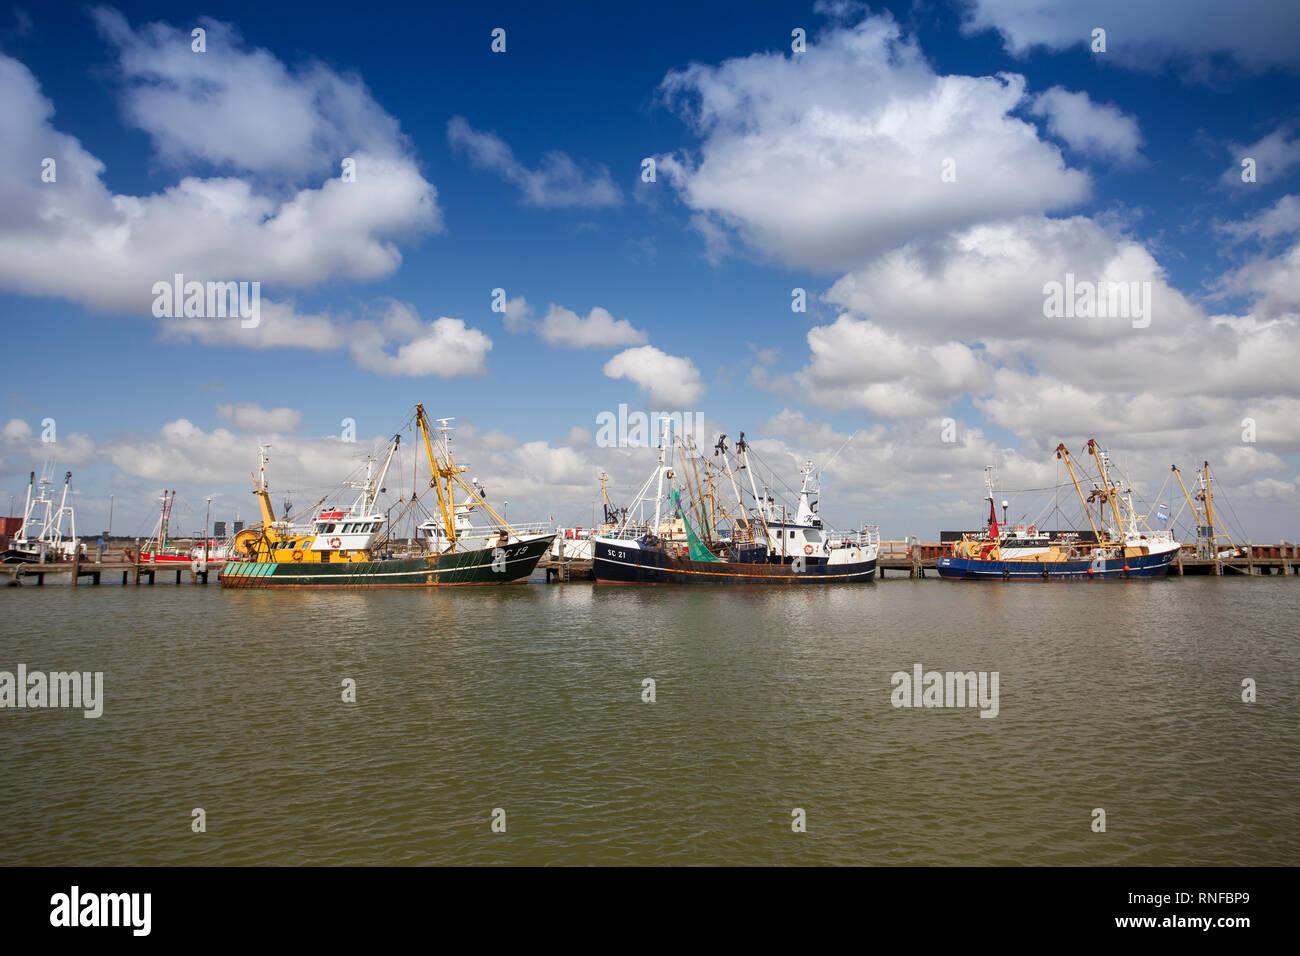 Fishing boats in the fishing port of Roemoe, Juetland, Denmark, Europe - Stock Image